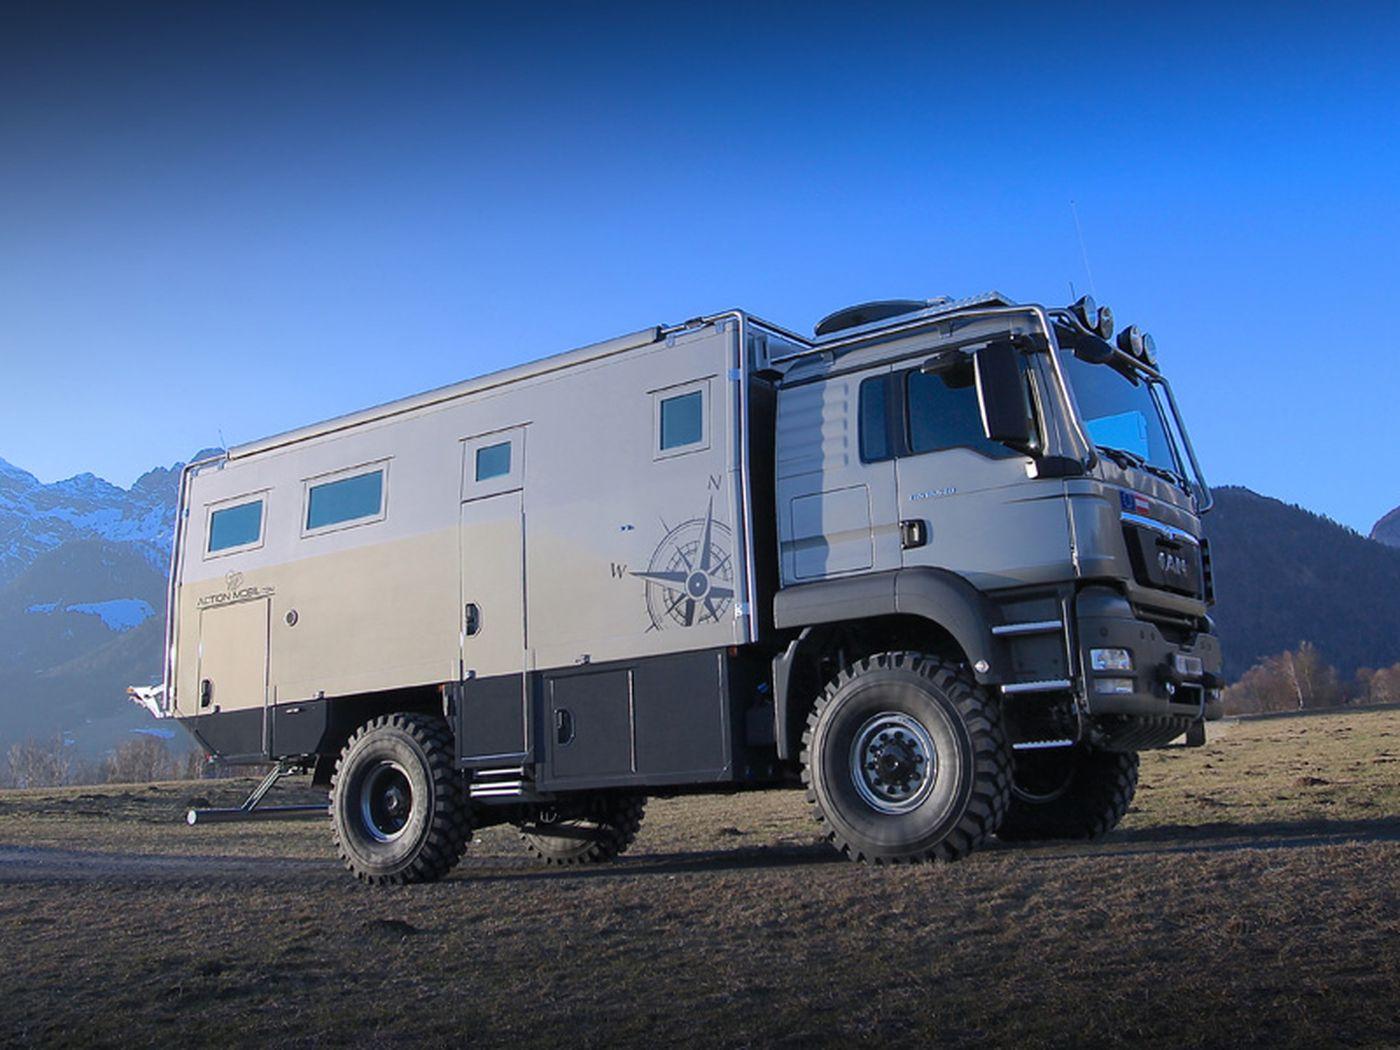 Atacama 6300 RV